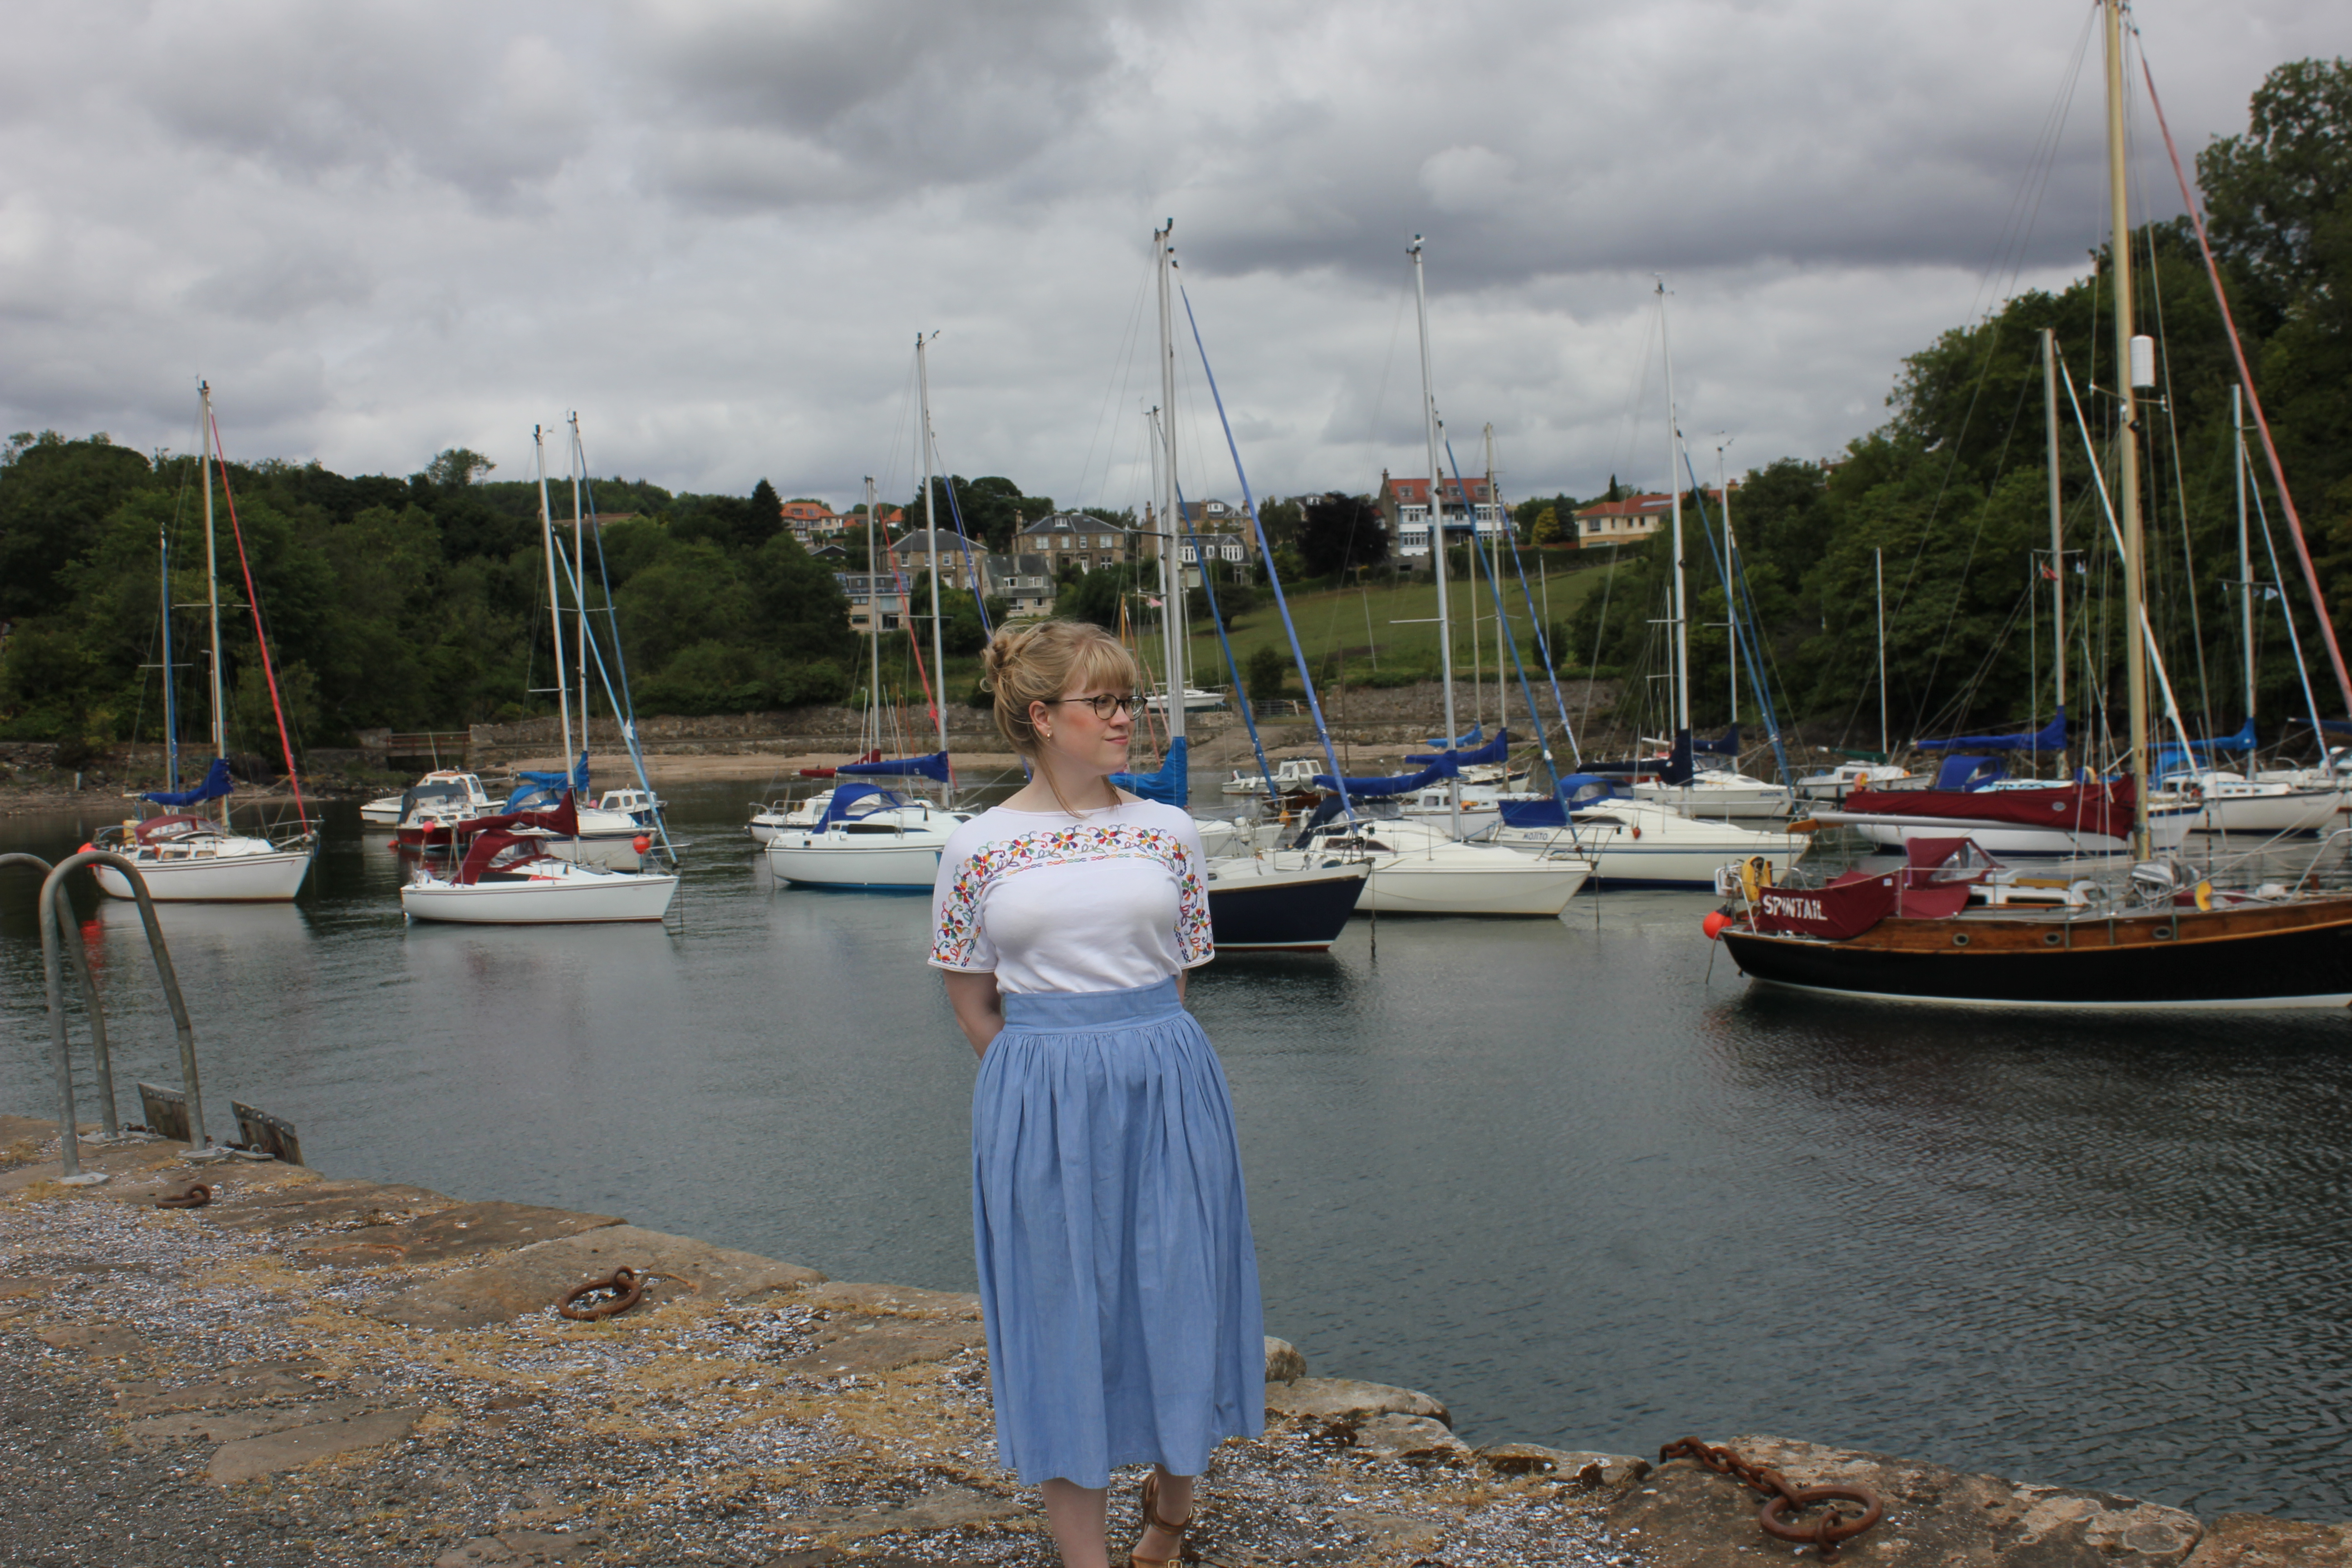 '50s dirndl skirt